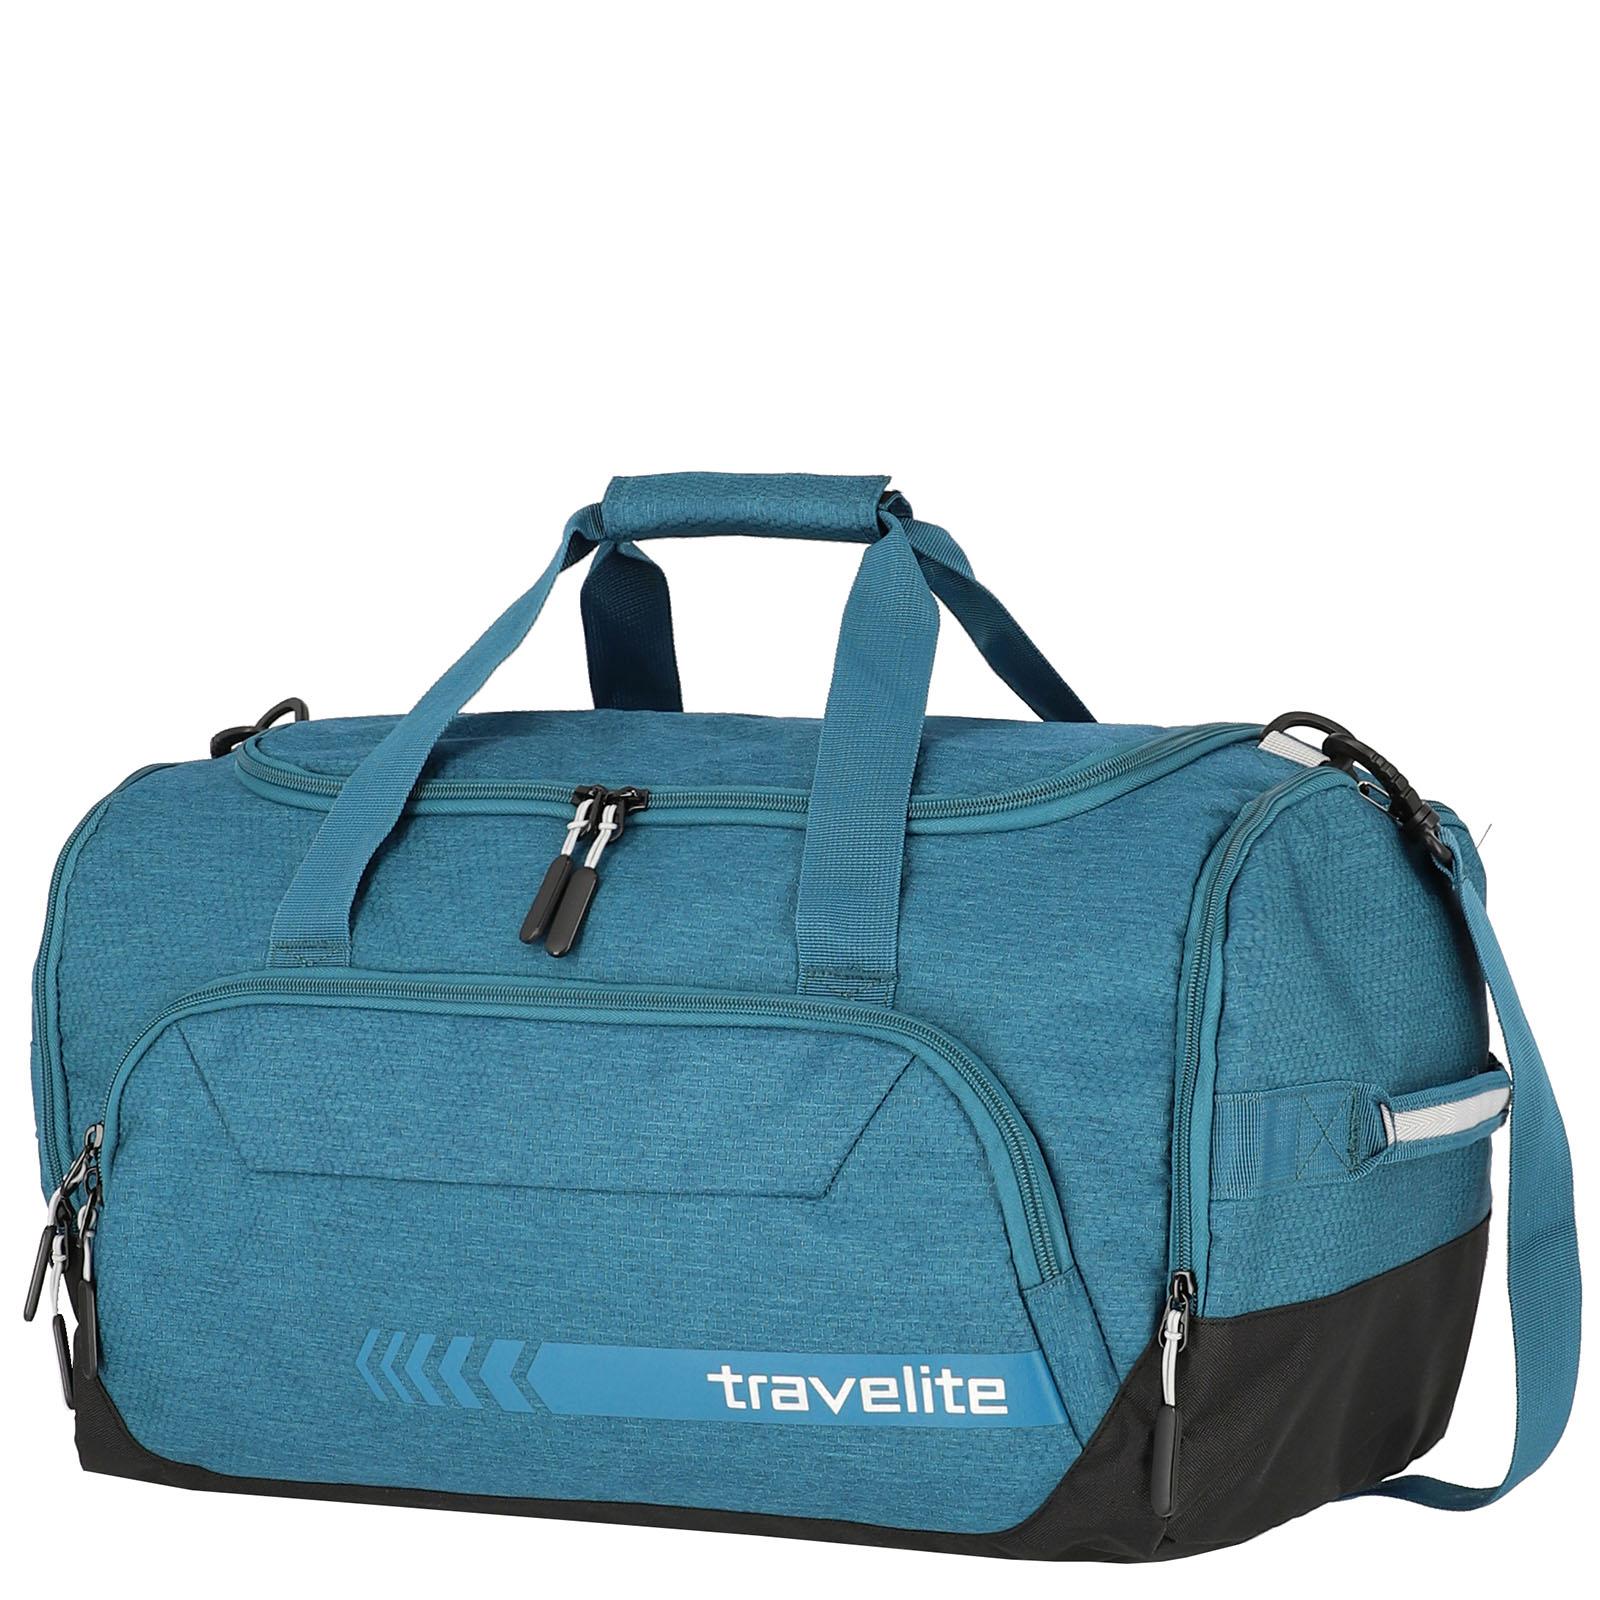 travelite-kick-off-reisetasche-m-petrol